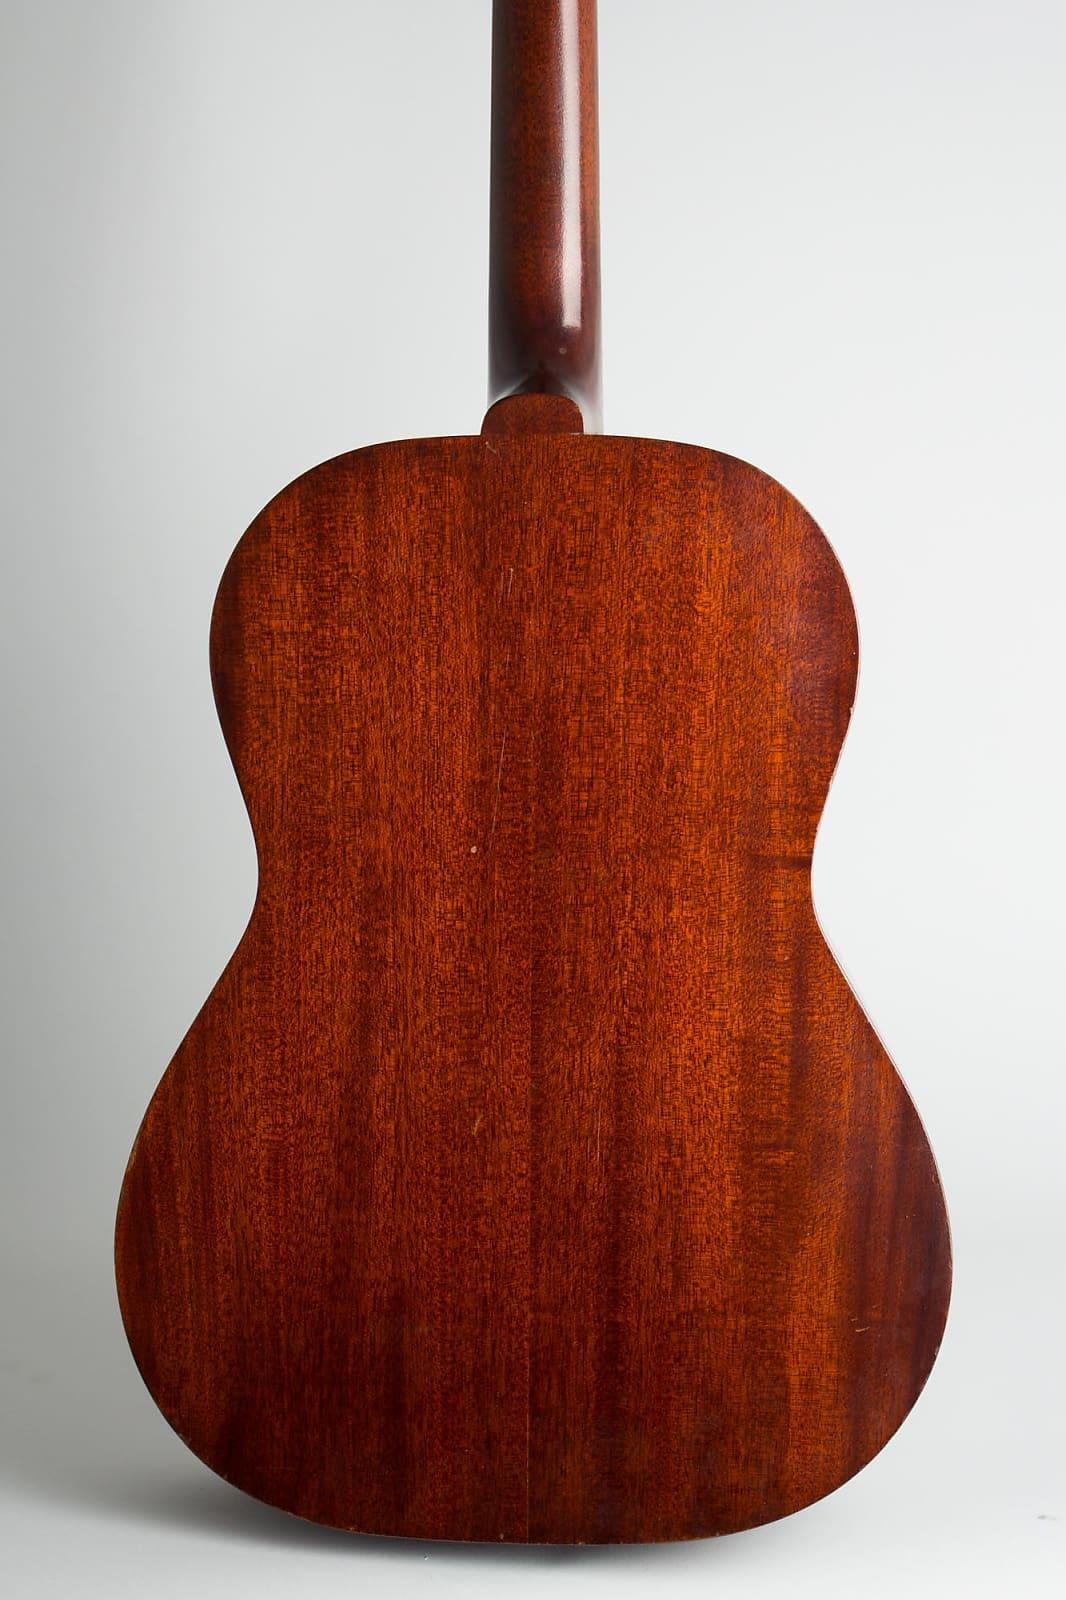 Gibson  LG-0 Flat Top Acoustic Guitar (1961), ser. #35502, original brown chipboard case.